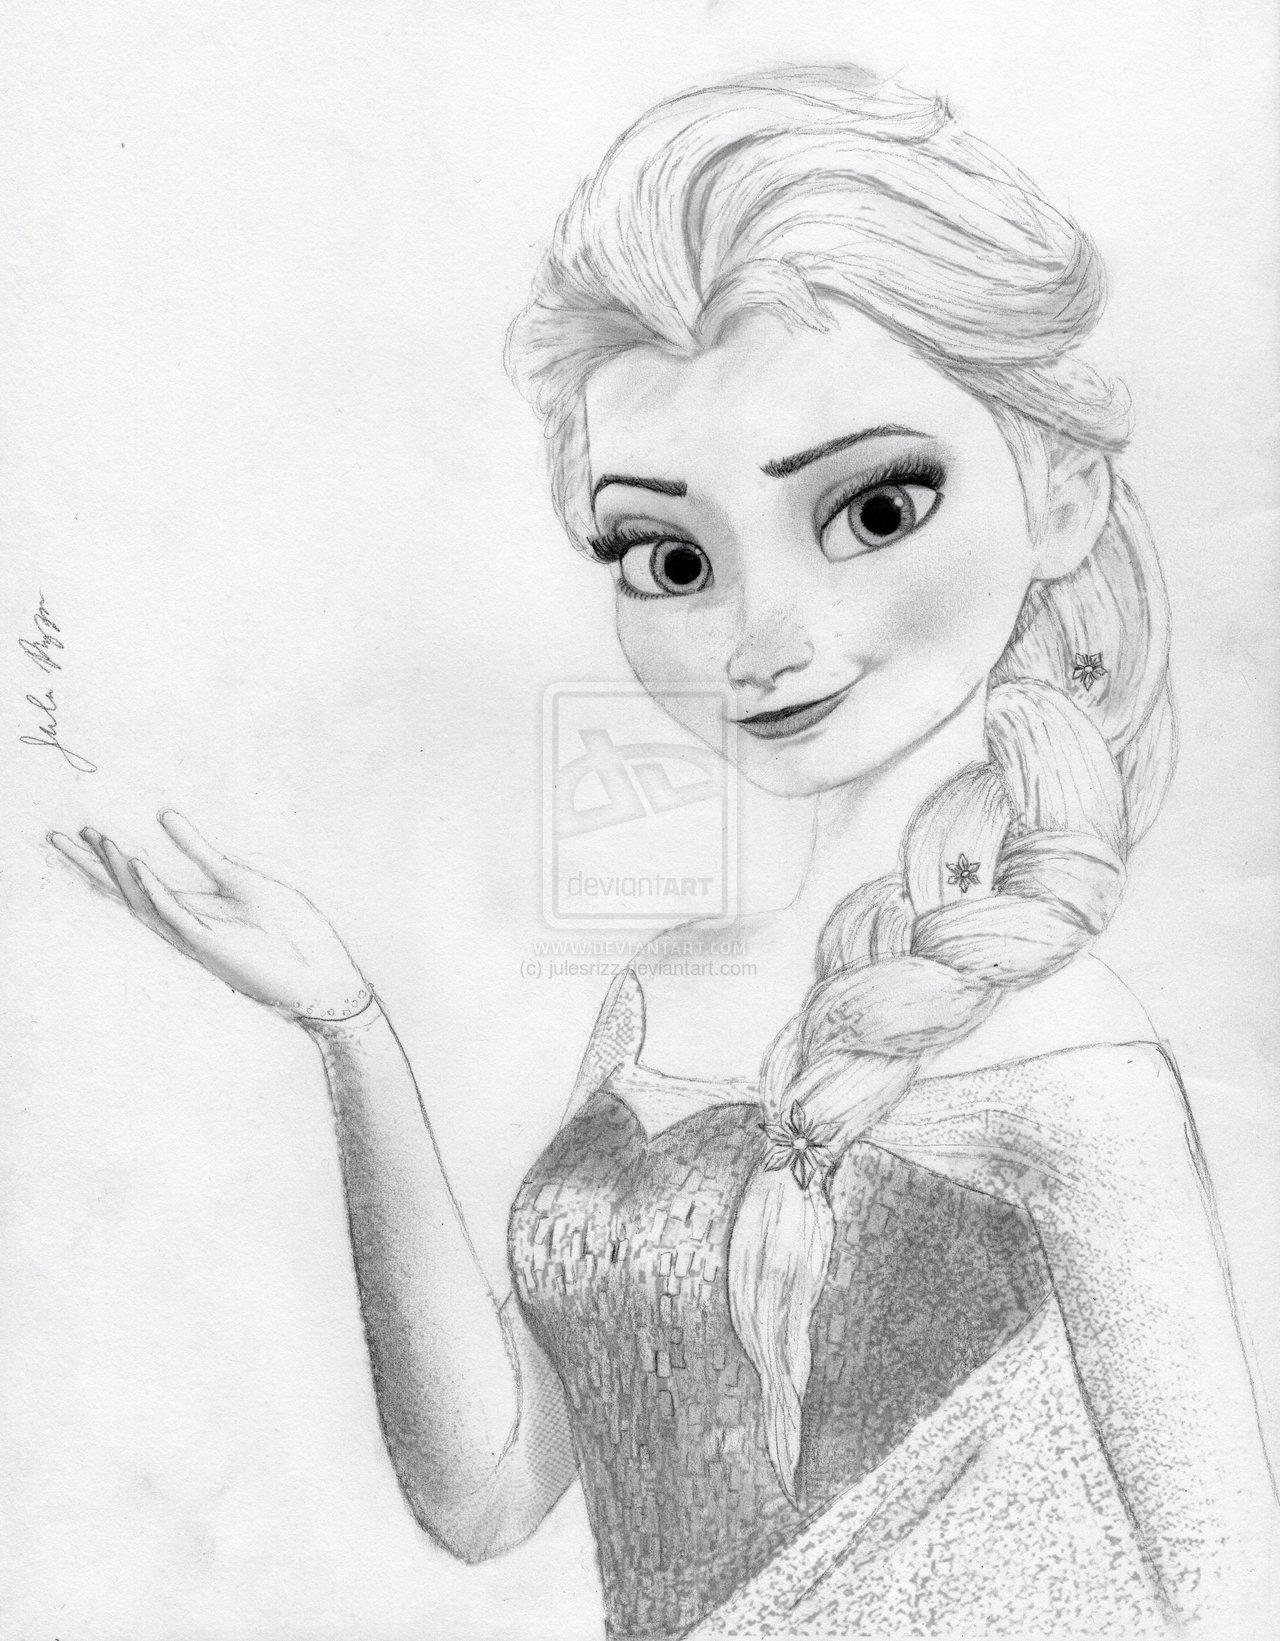 Drawn princess anna frozen Elsa Coronation Frozen on Pencil